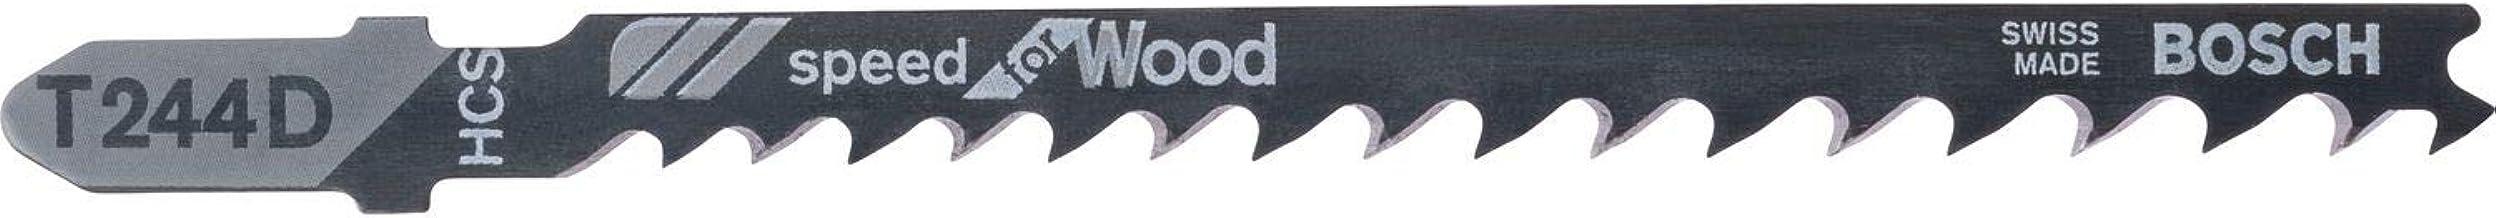 Bosch 2608630058 Speed Wood 1 Lug 244 D (Pack of 5)